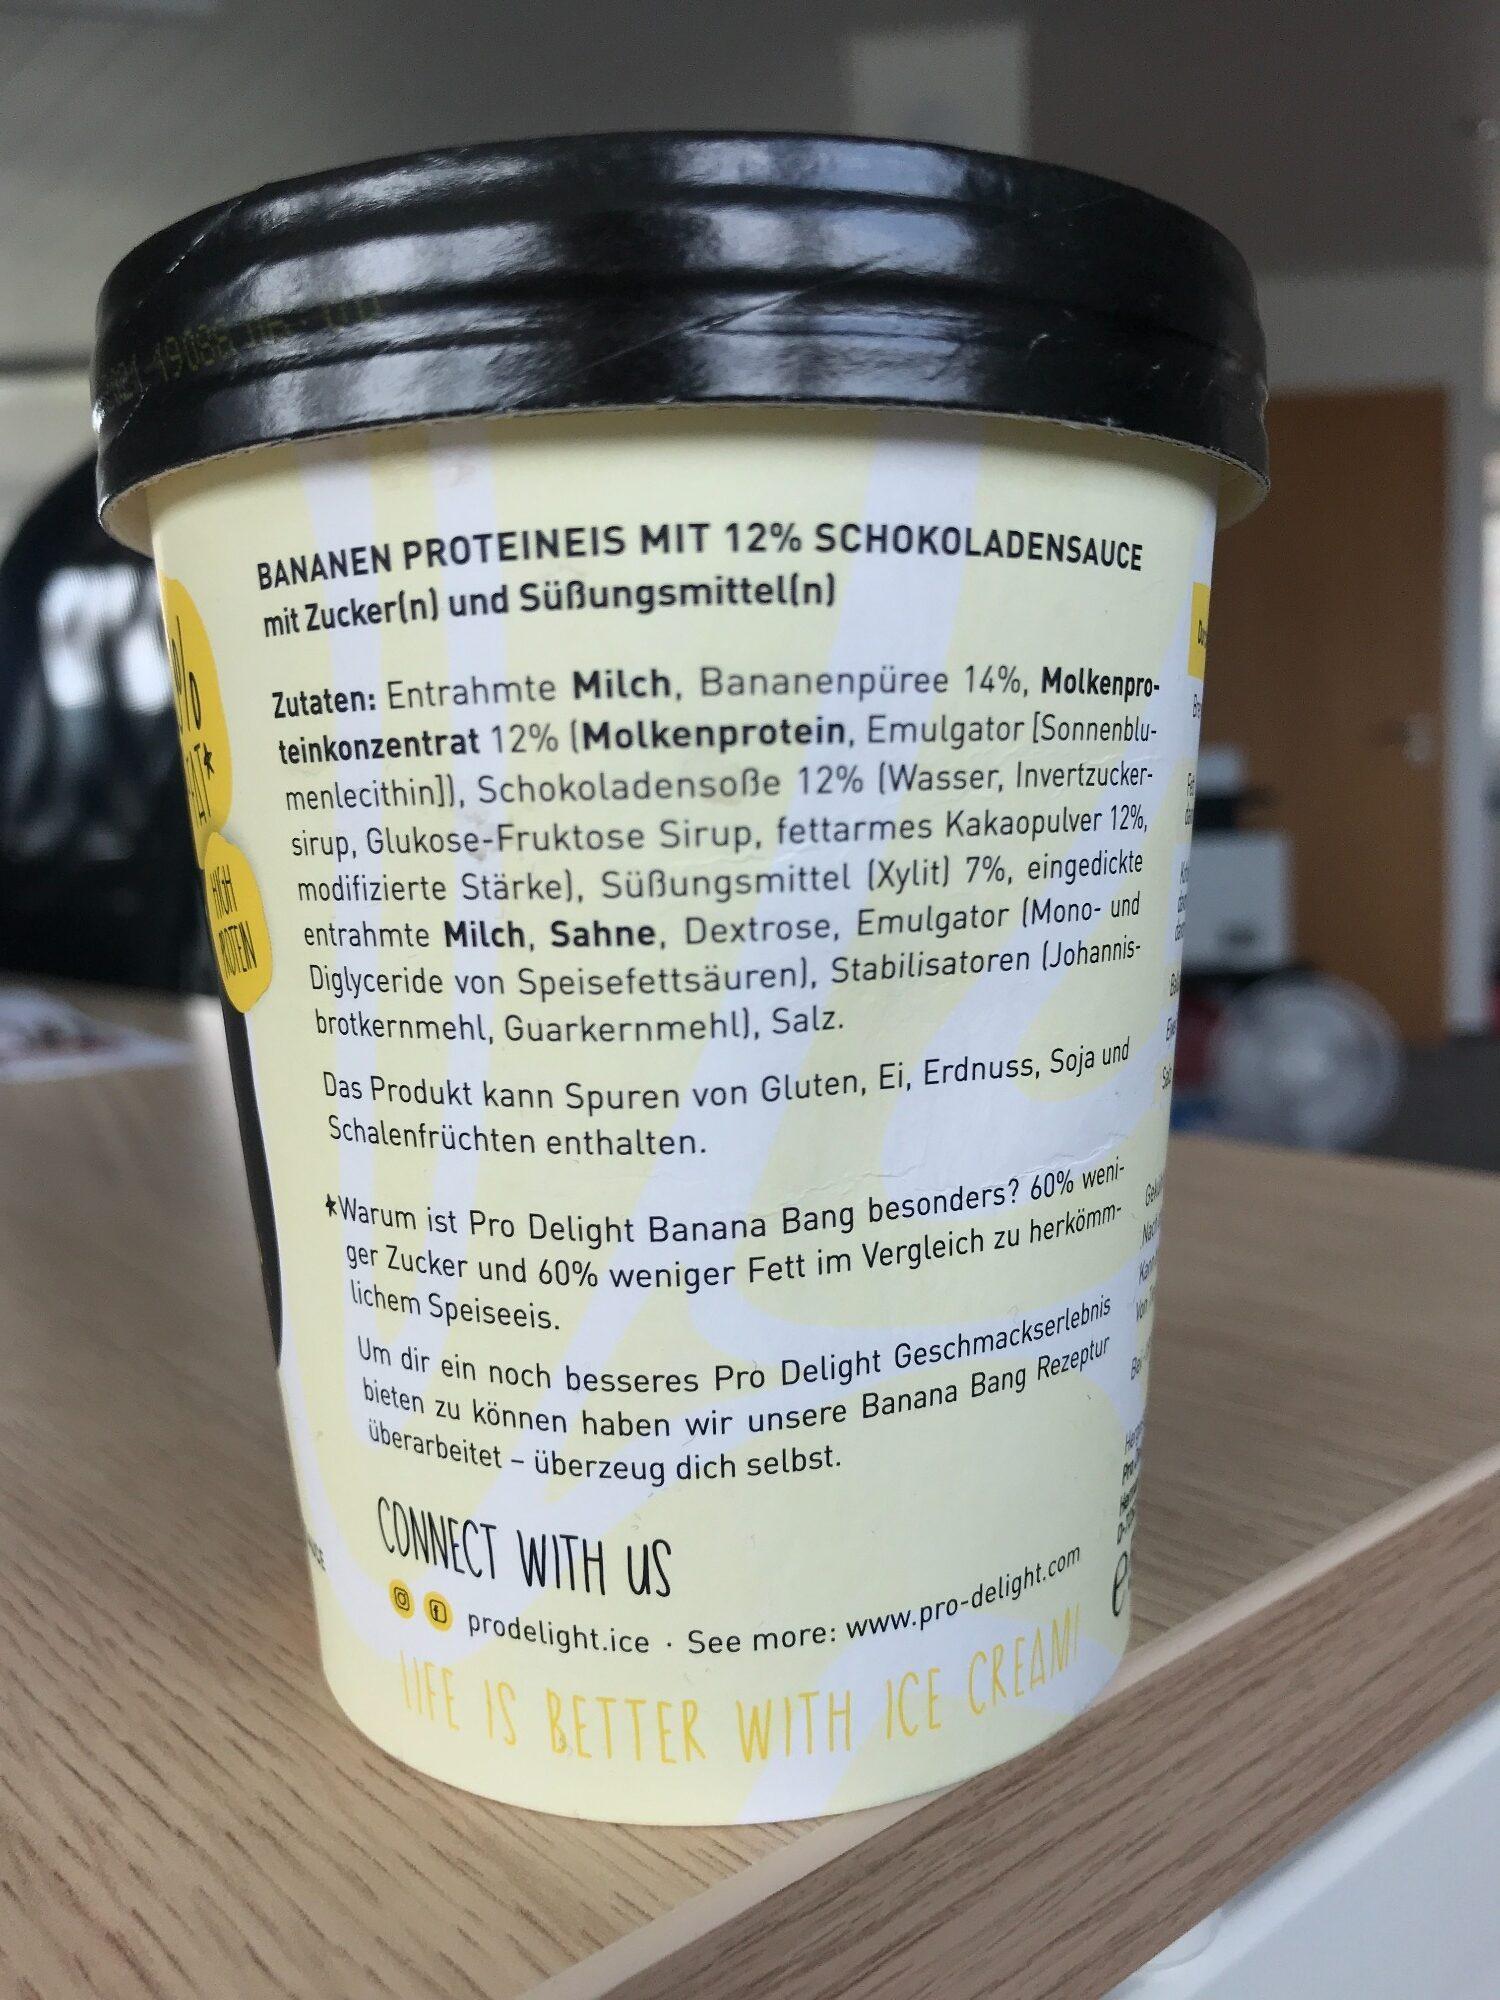 Pro Delight Banana Bang 500 ml - Ingredients